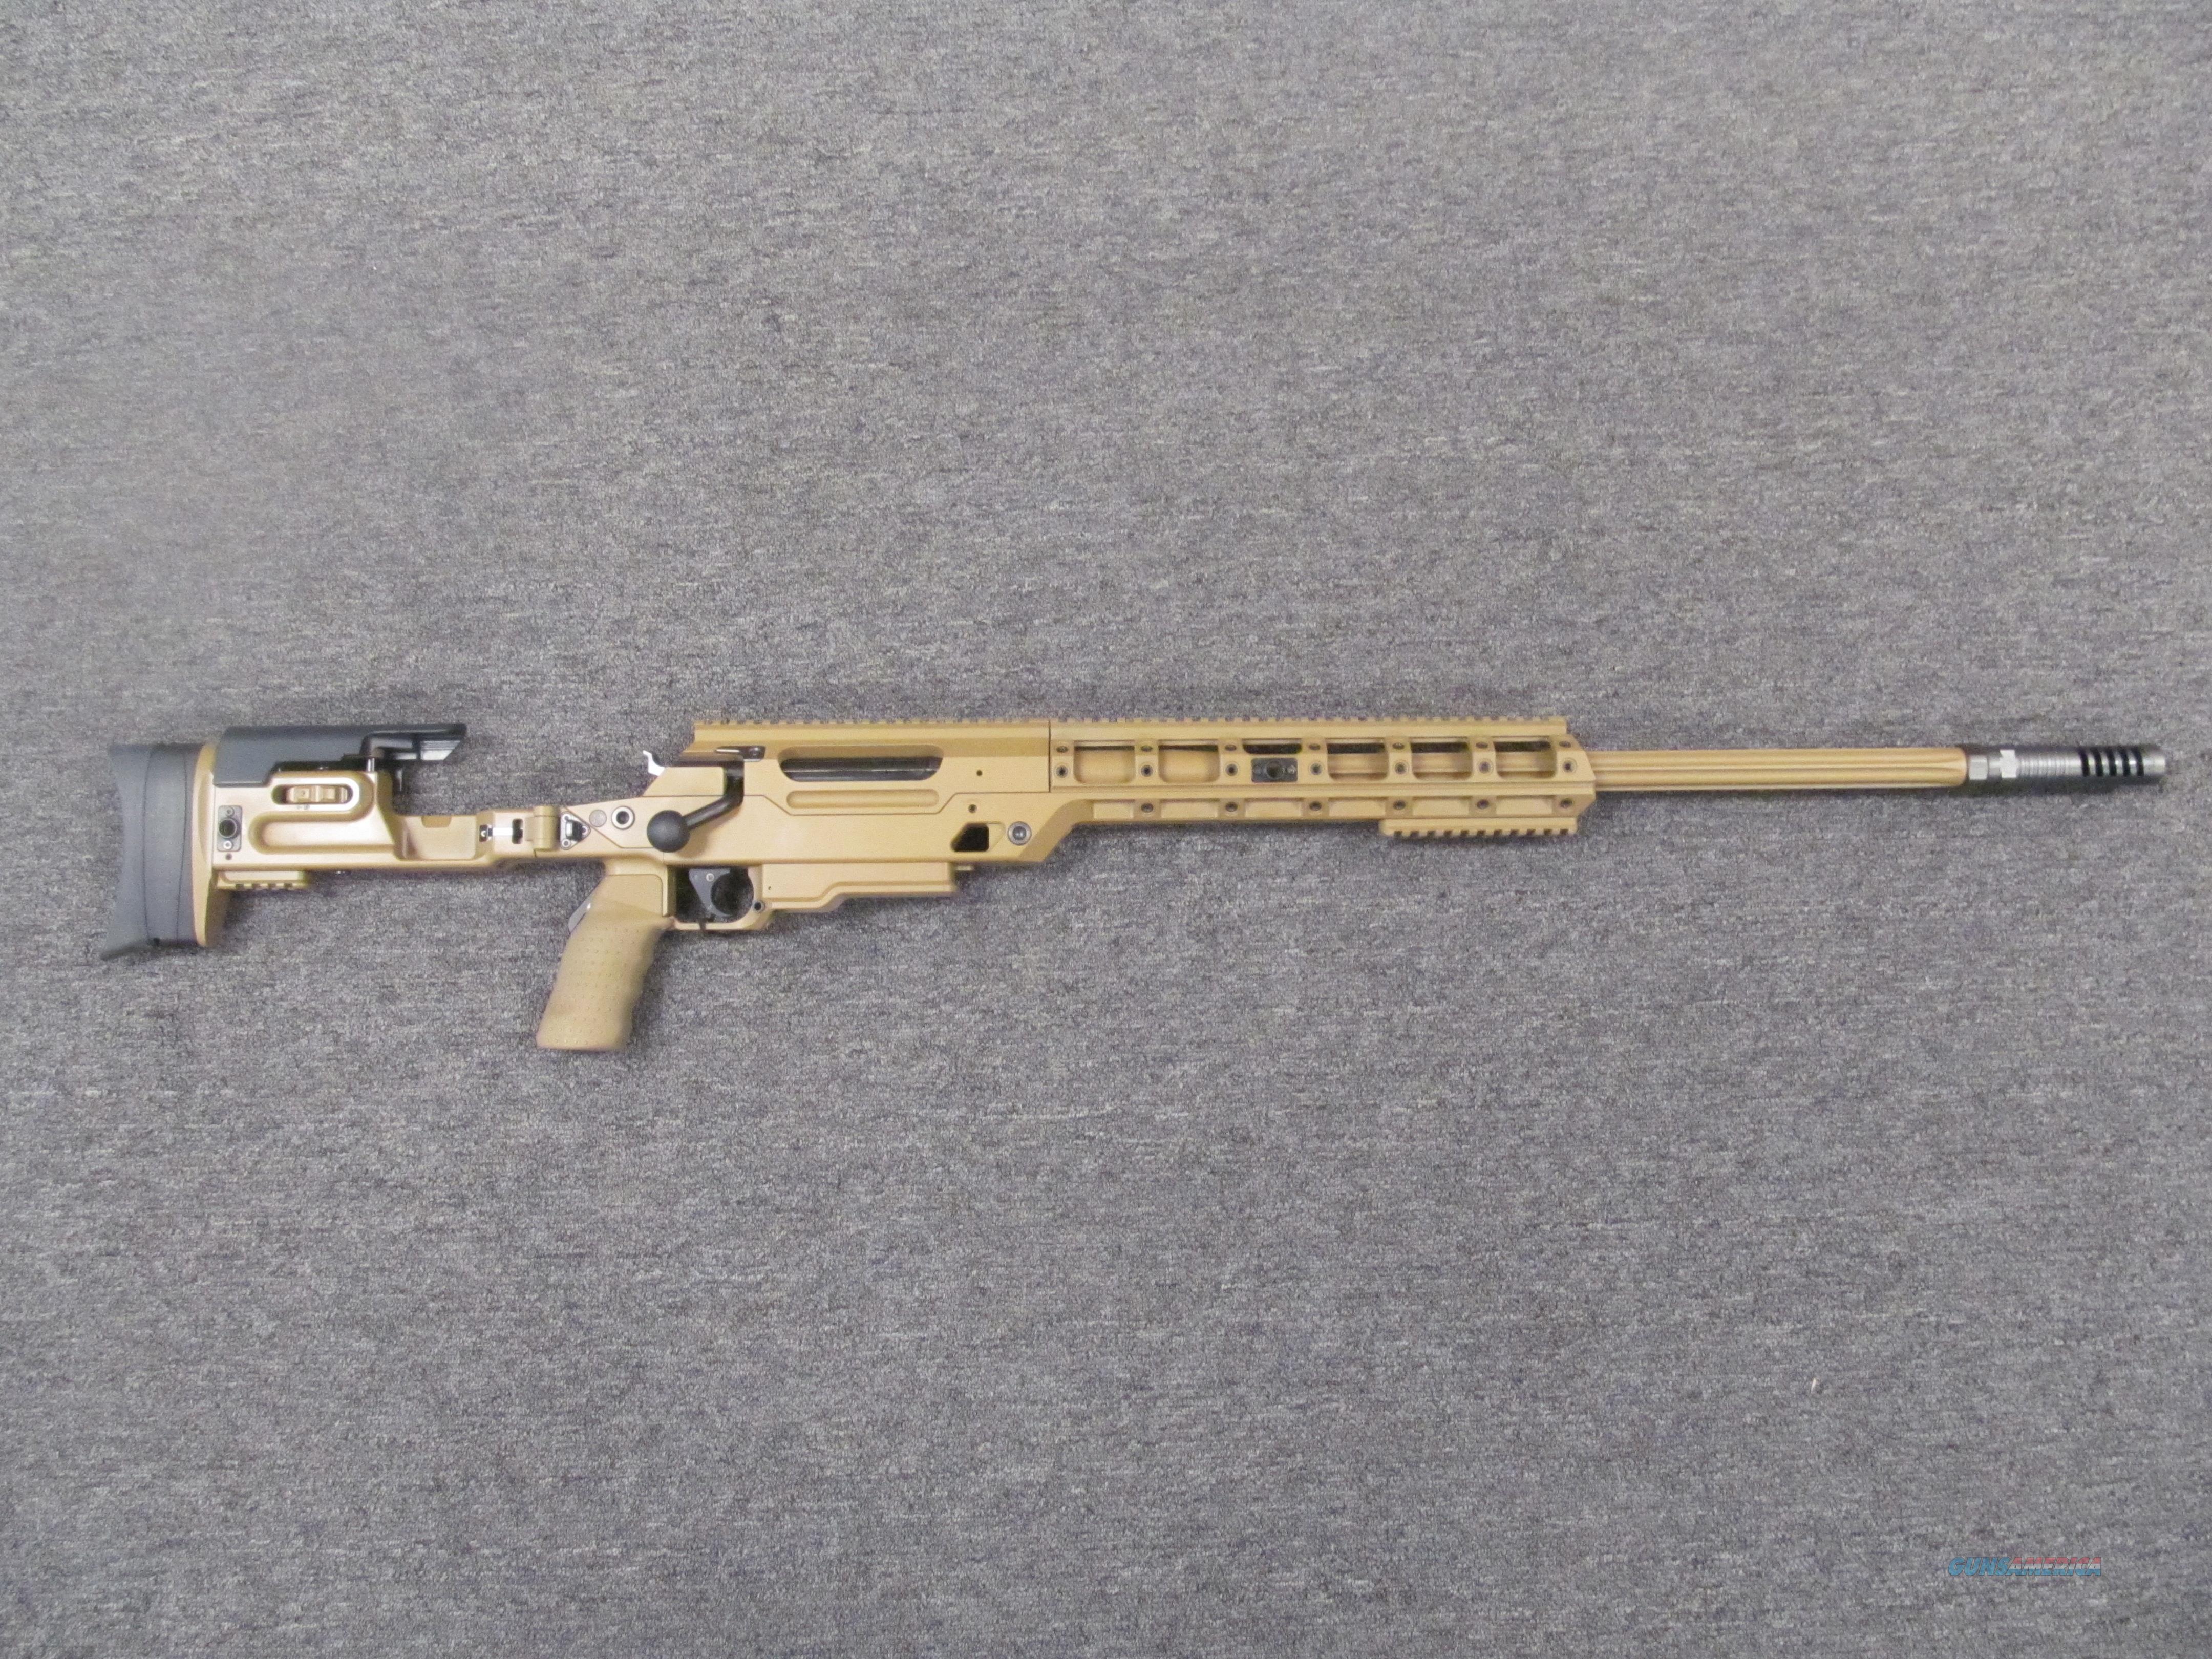 FNH Ballista in .338 Lapua w/FDE Finish  Guns > Rifles > FNH - Fabrique Nationale (FN) Rifles > Bolt action > Tactical